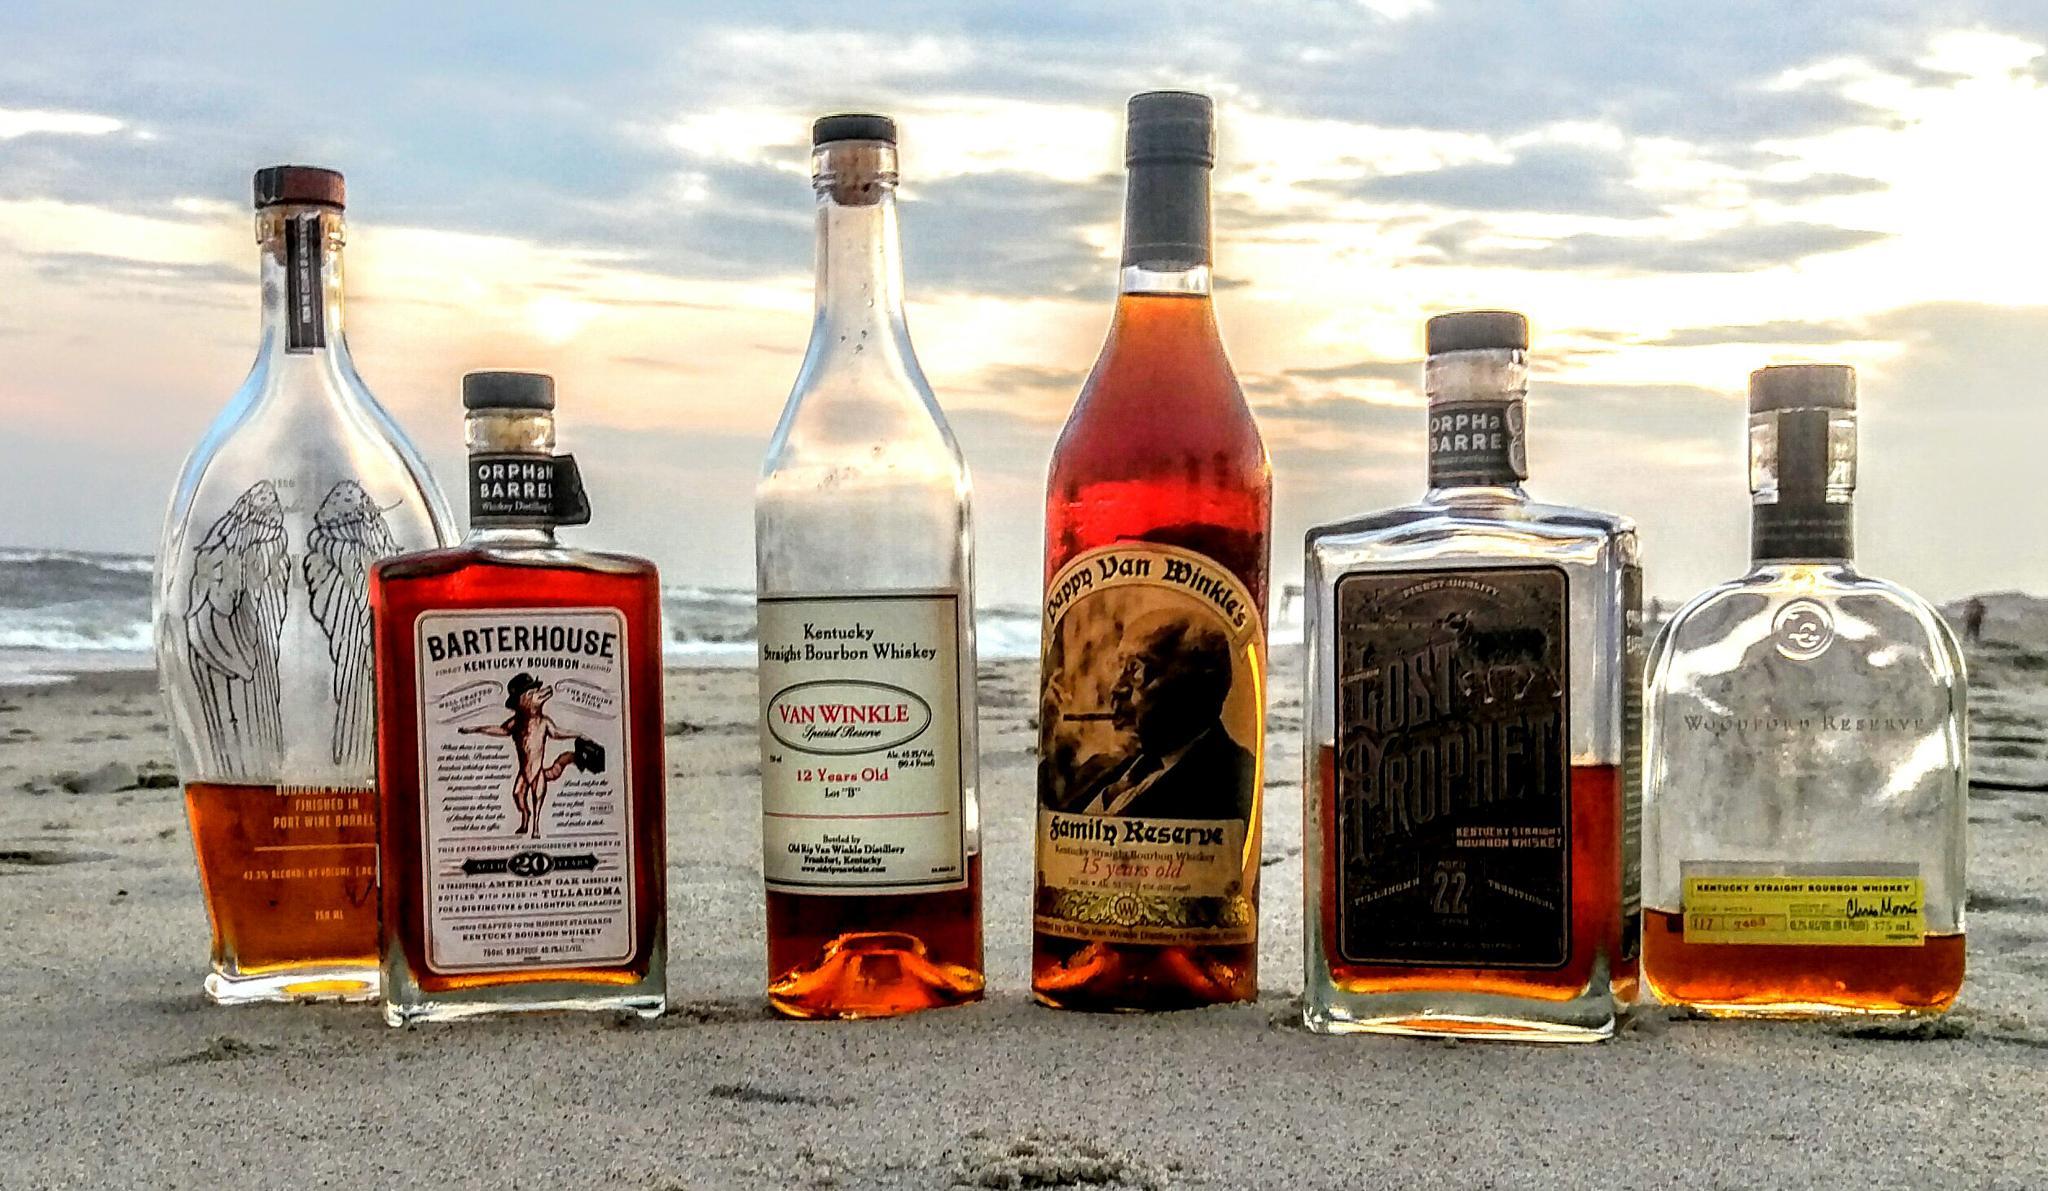 Respectable Bourbon Line up on the Beach by Dennis  Geiser